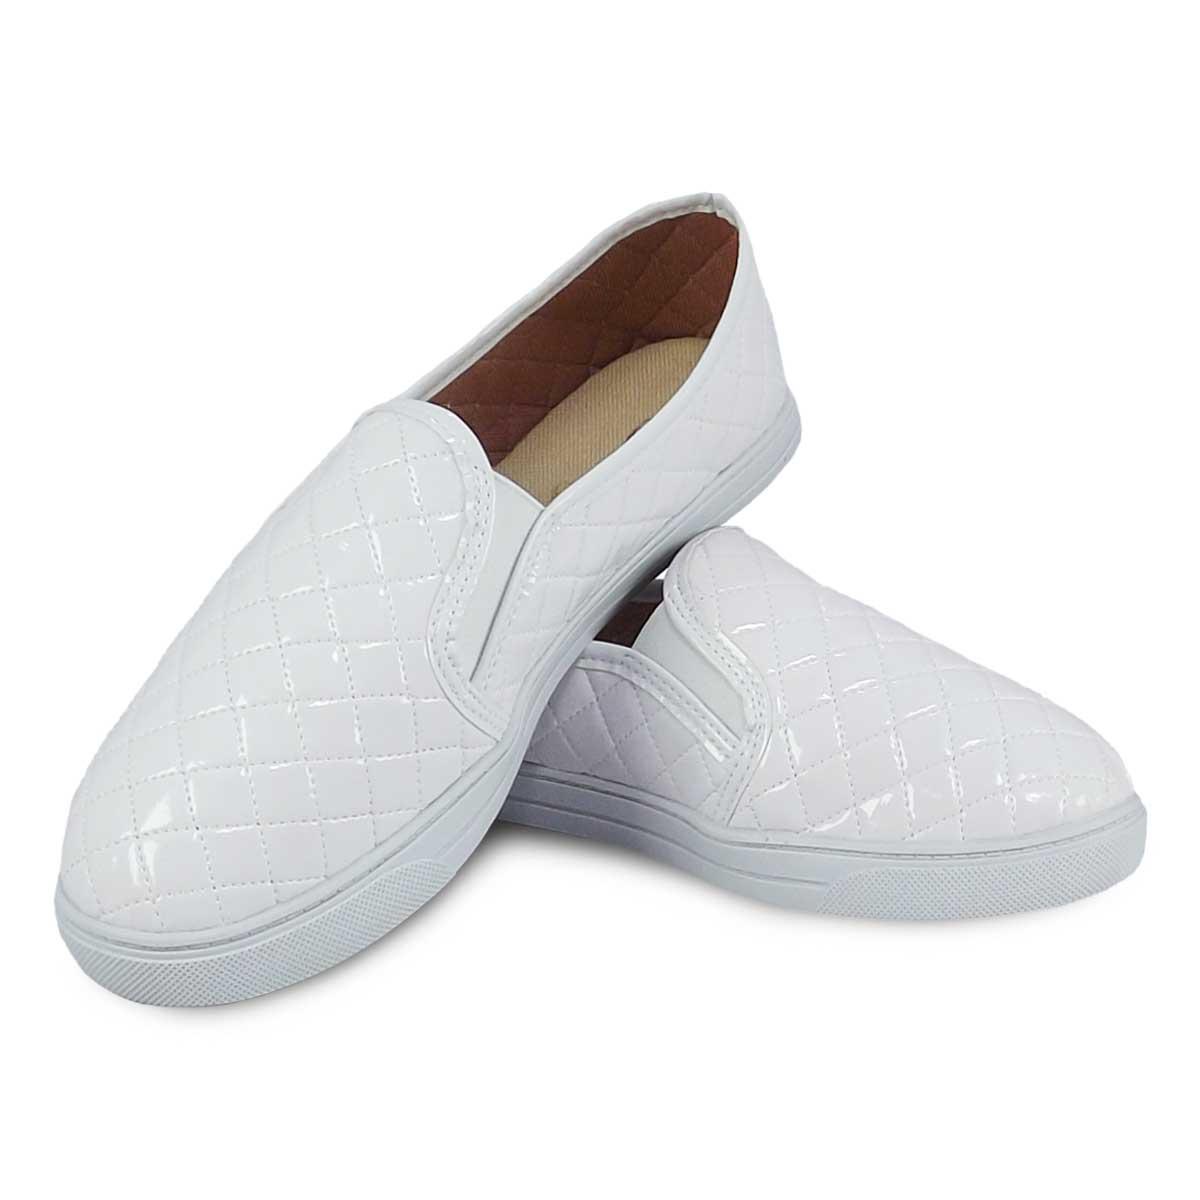 bfa82f6ed9 Itra - Distribuidora de Calçados. Sapatenis Iate Sola Branca